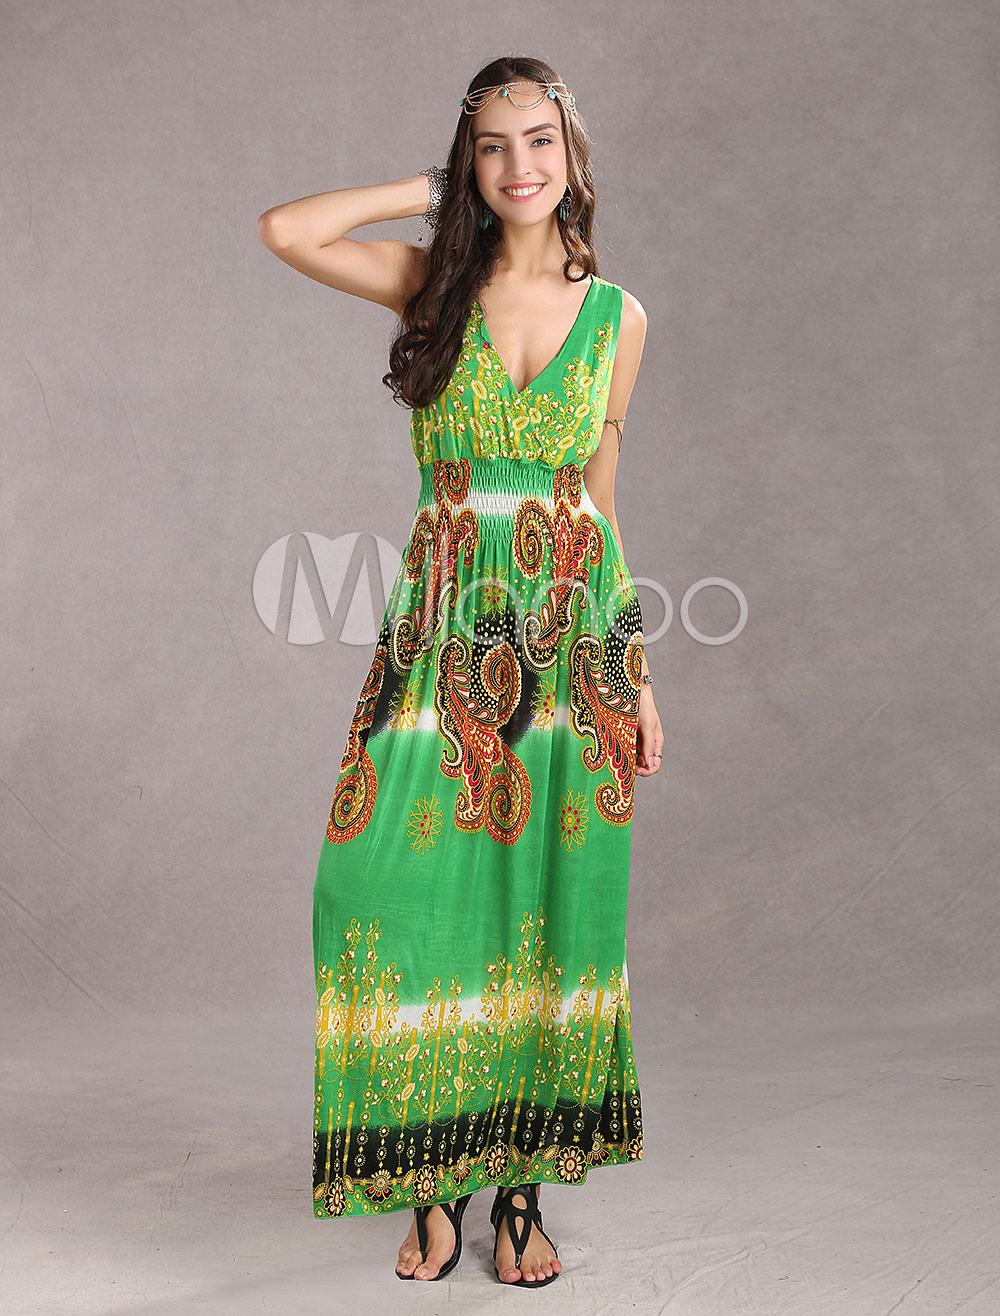 Trendy Green Meryl Deep Plunging Necklines Sleeveless Floral Ladies Maxi Dress (Women\\'s Clothing Maxi Dresses) photo